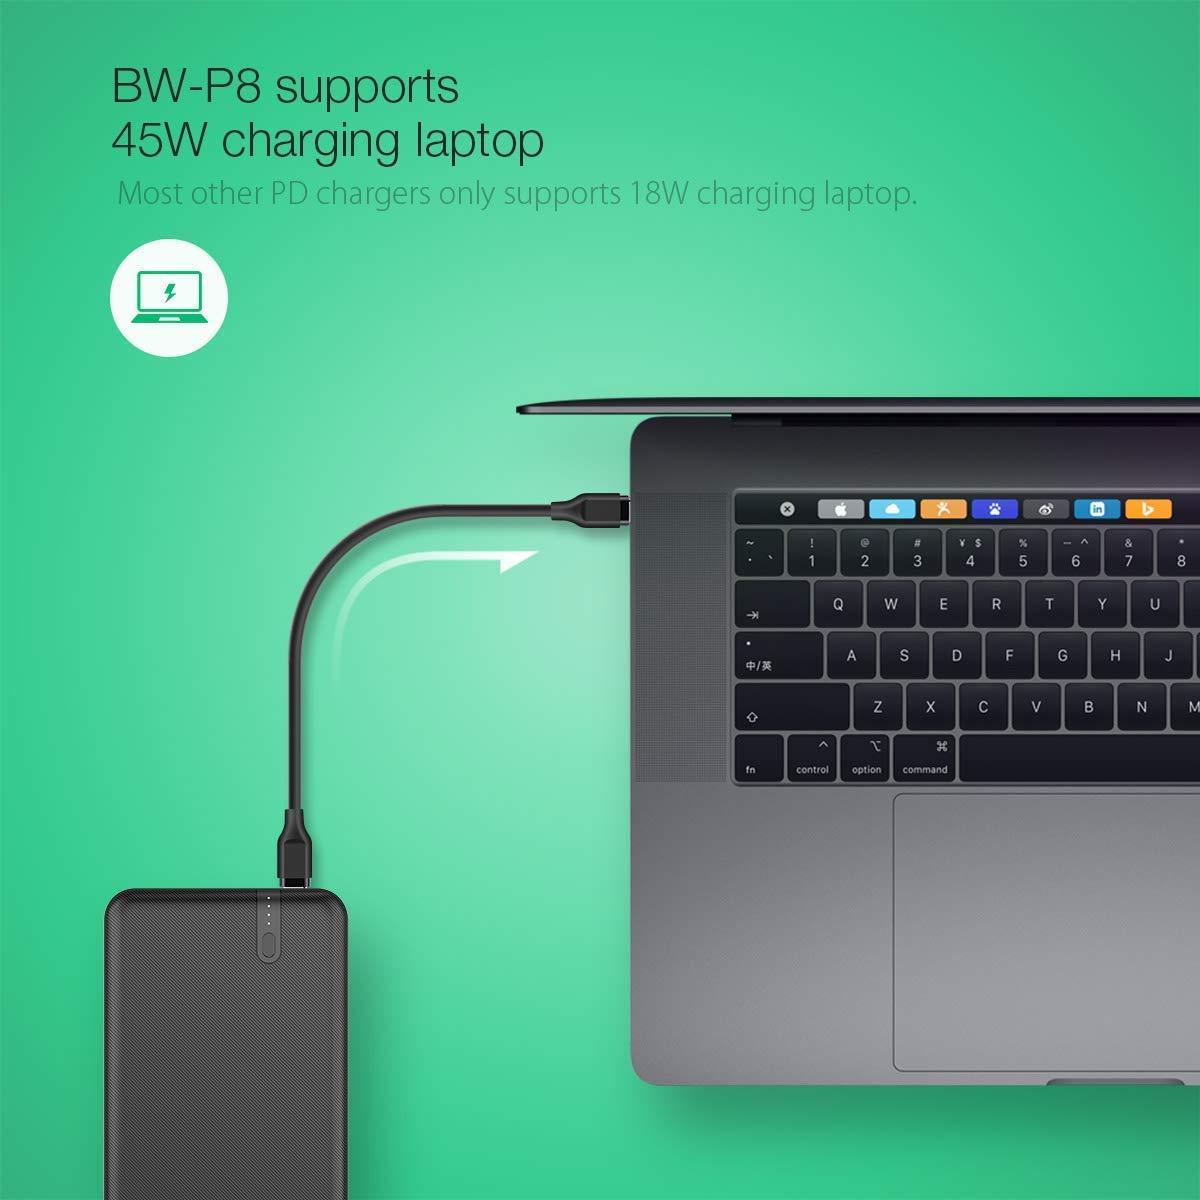 Samsung Xiaomi Huawei BlitzWolf Bater/ía Externa 20000mAh Macbook y Ordenador Port/átil iPad 45W QC3.0 PD3.0 Power Bank Dual USB y Tipo C Cargador Port/átil Carga R/ápida para iPhone